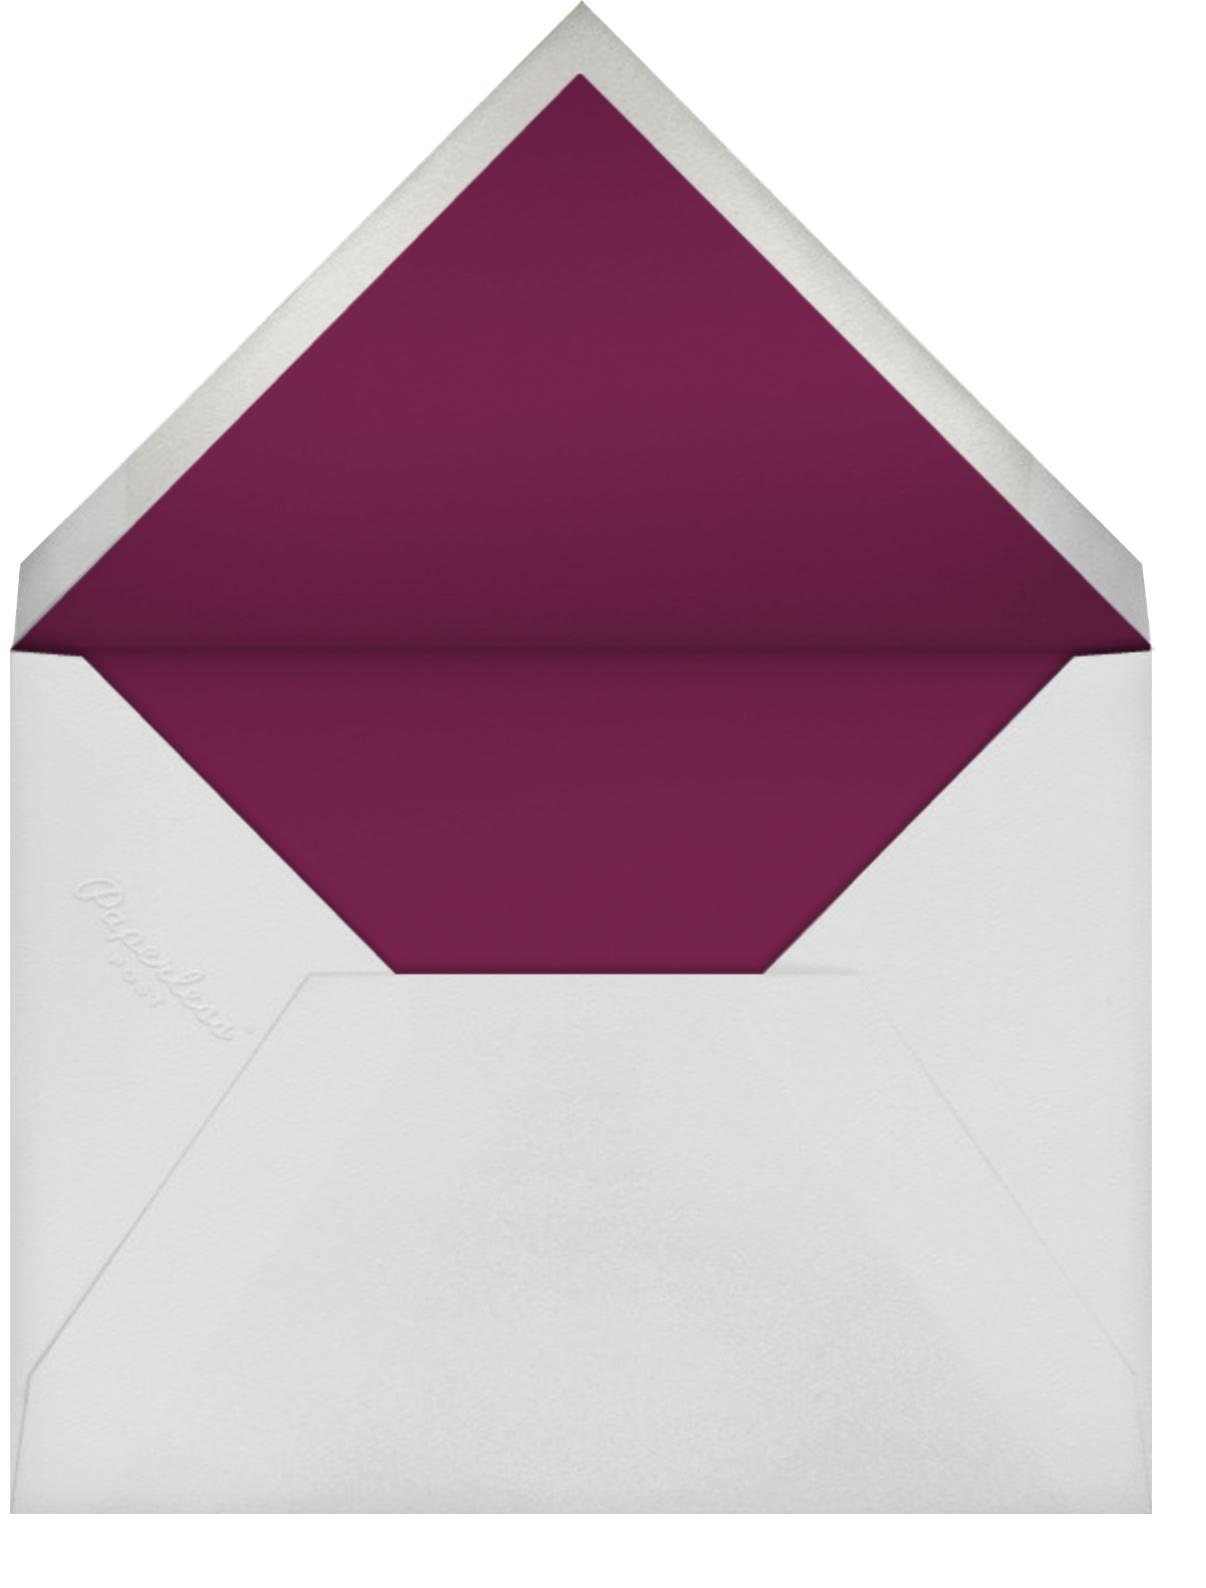 Vineyard I (Invitation) - Burgundy - Paperless Post - Professional events - envelope back